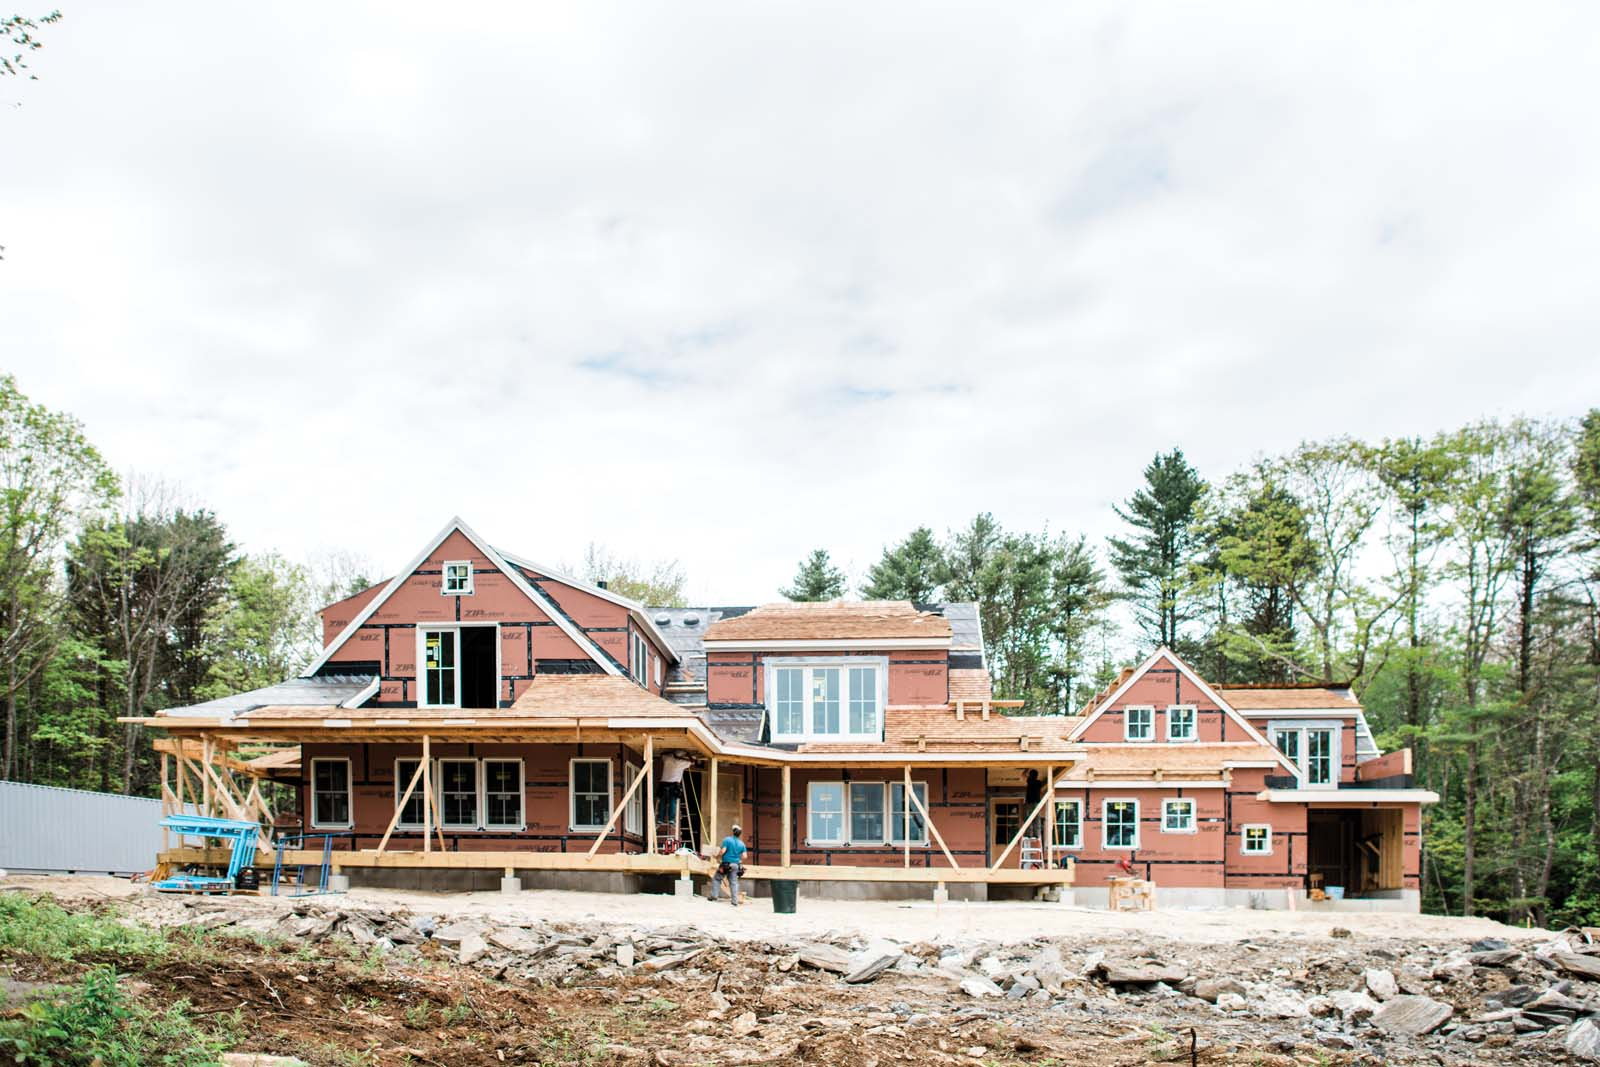 Profiles Archives - Maine Home + Design